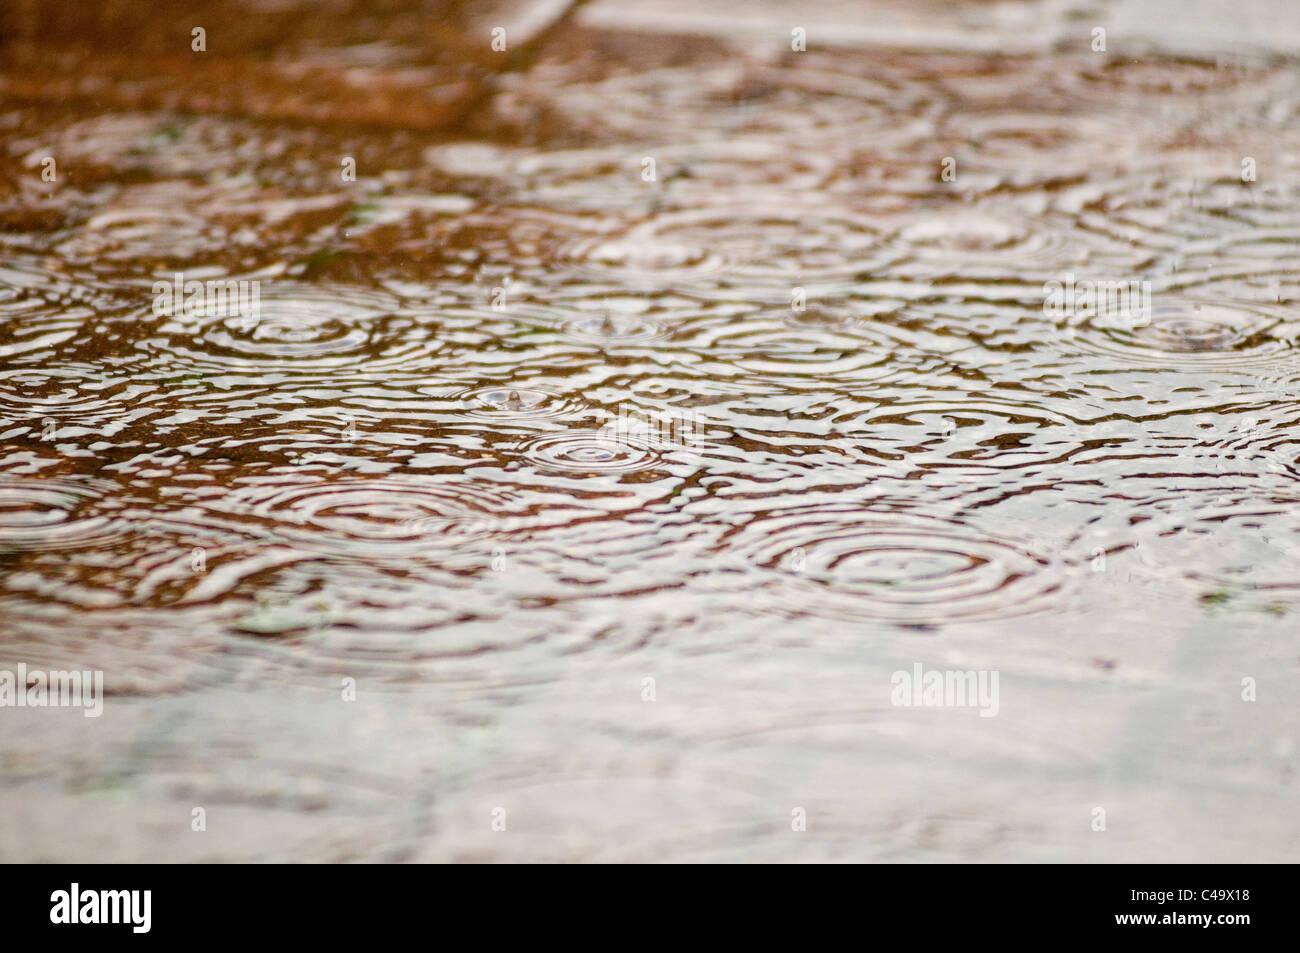 rain drop drops storm storms puddles splash splishing heavy downpour water fresh ripple ripples puddle puddles puddling - Stock Image